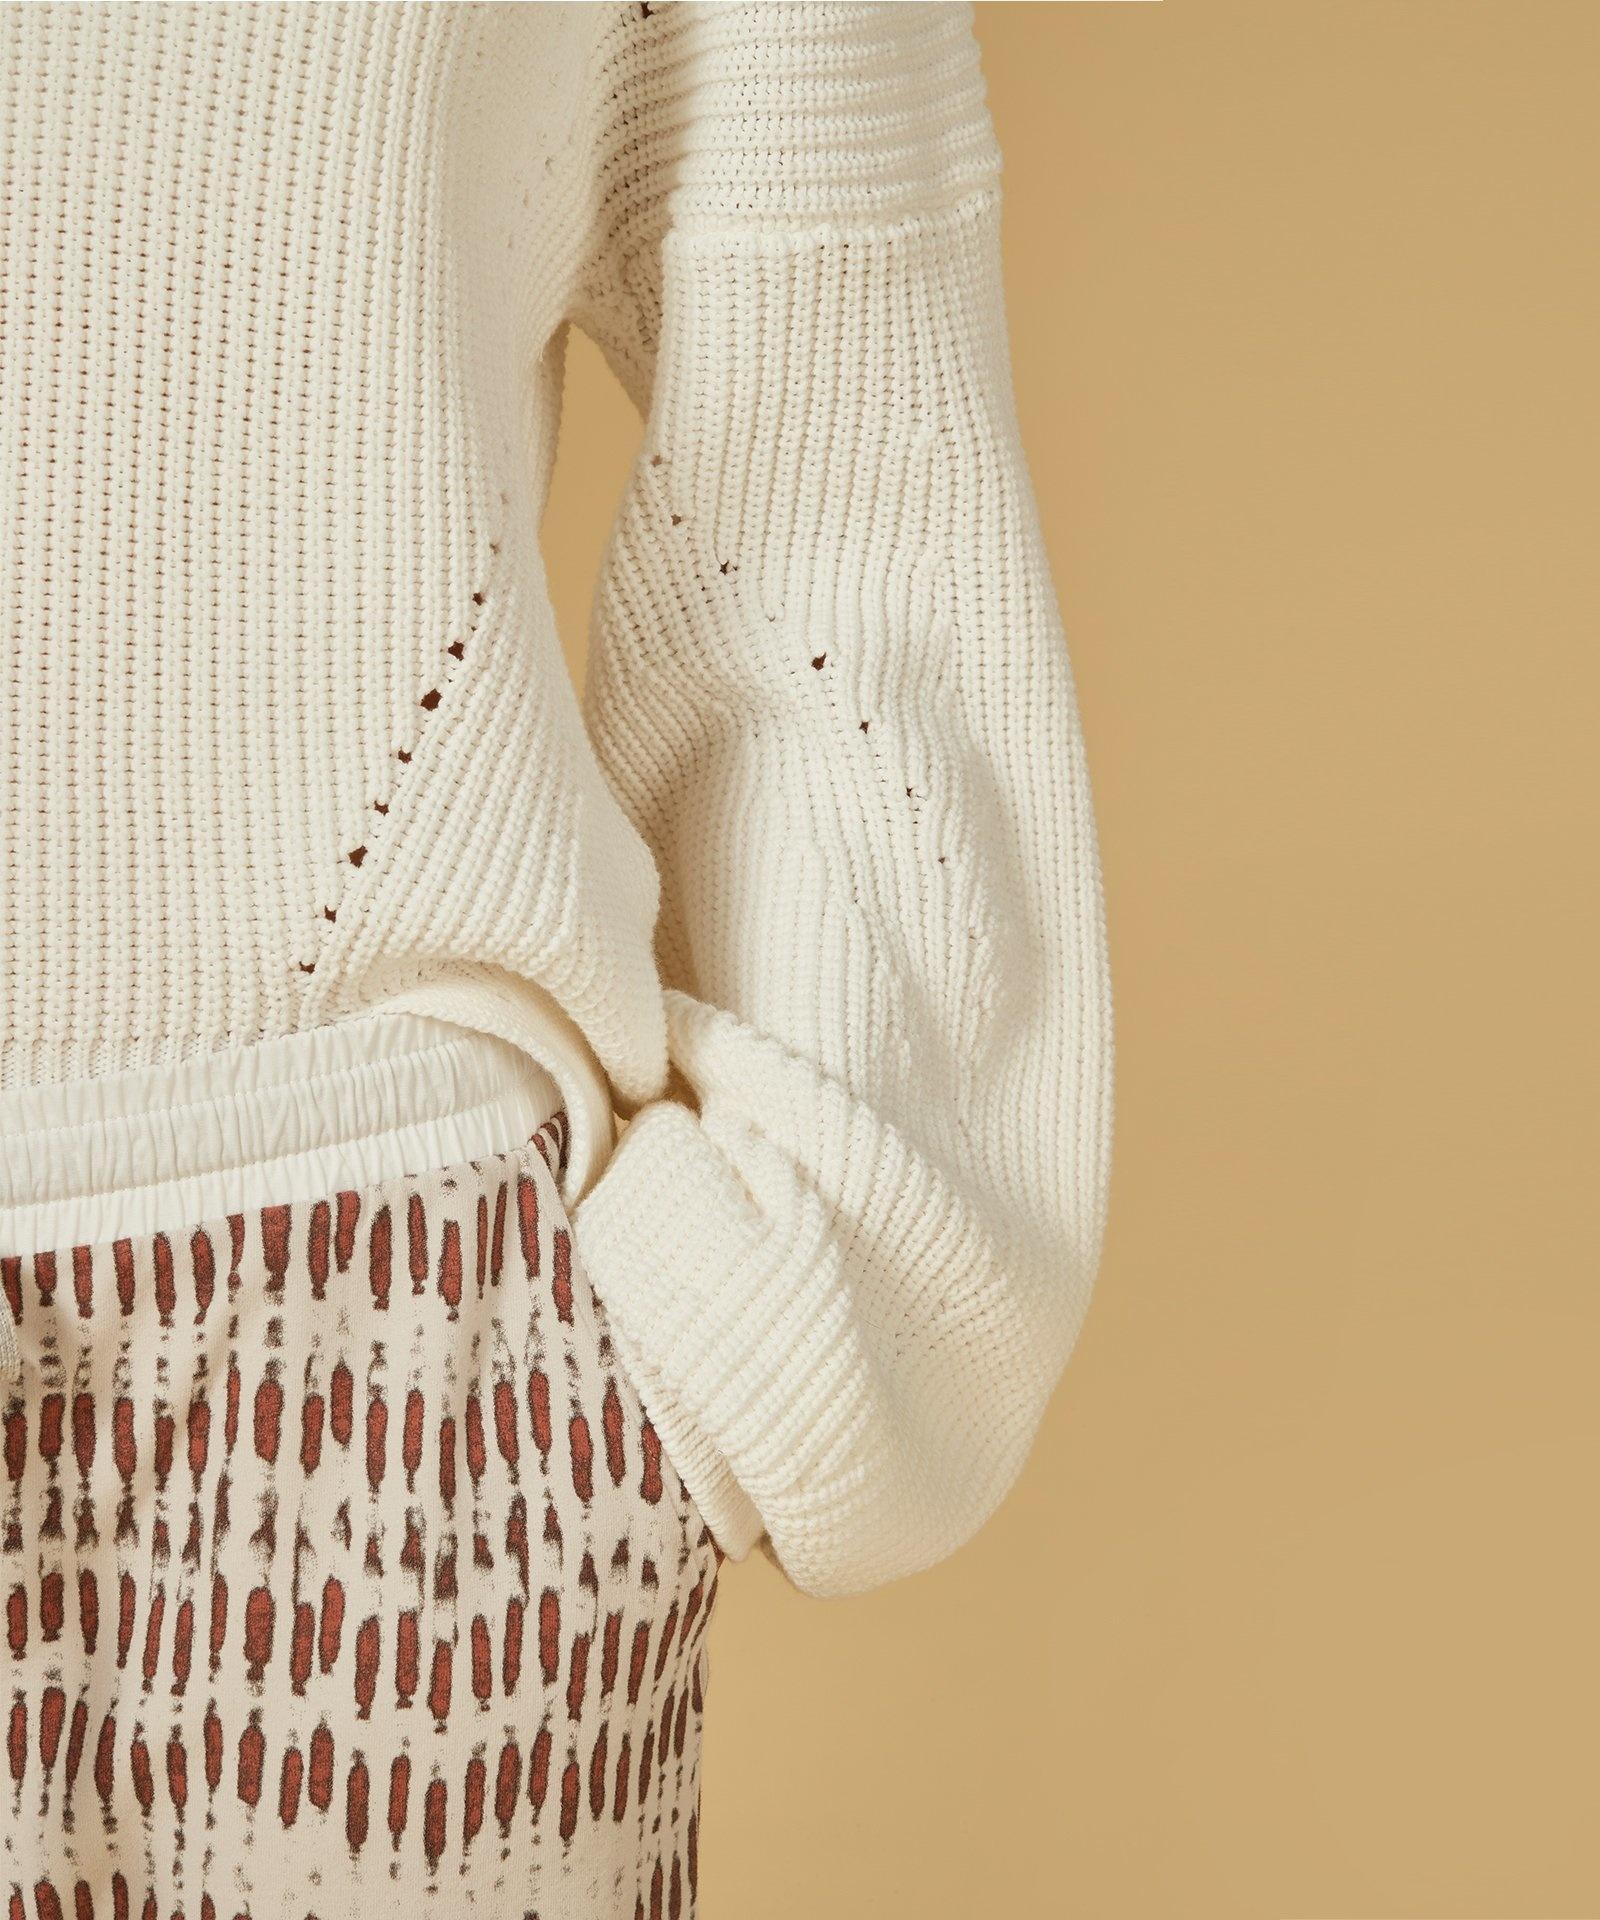 Trui sweater cotton knit white-5